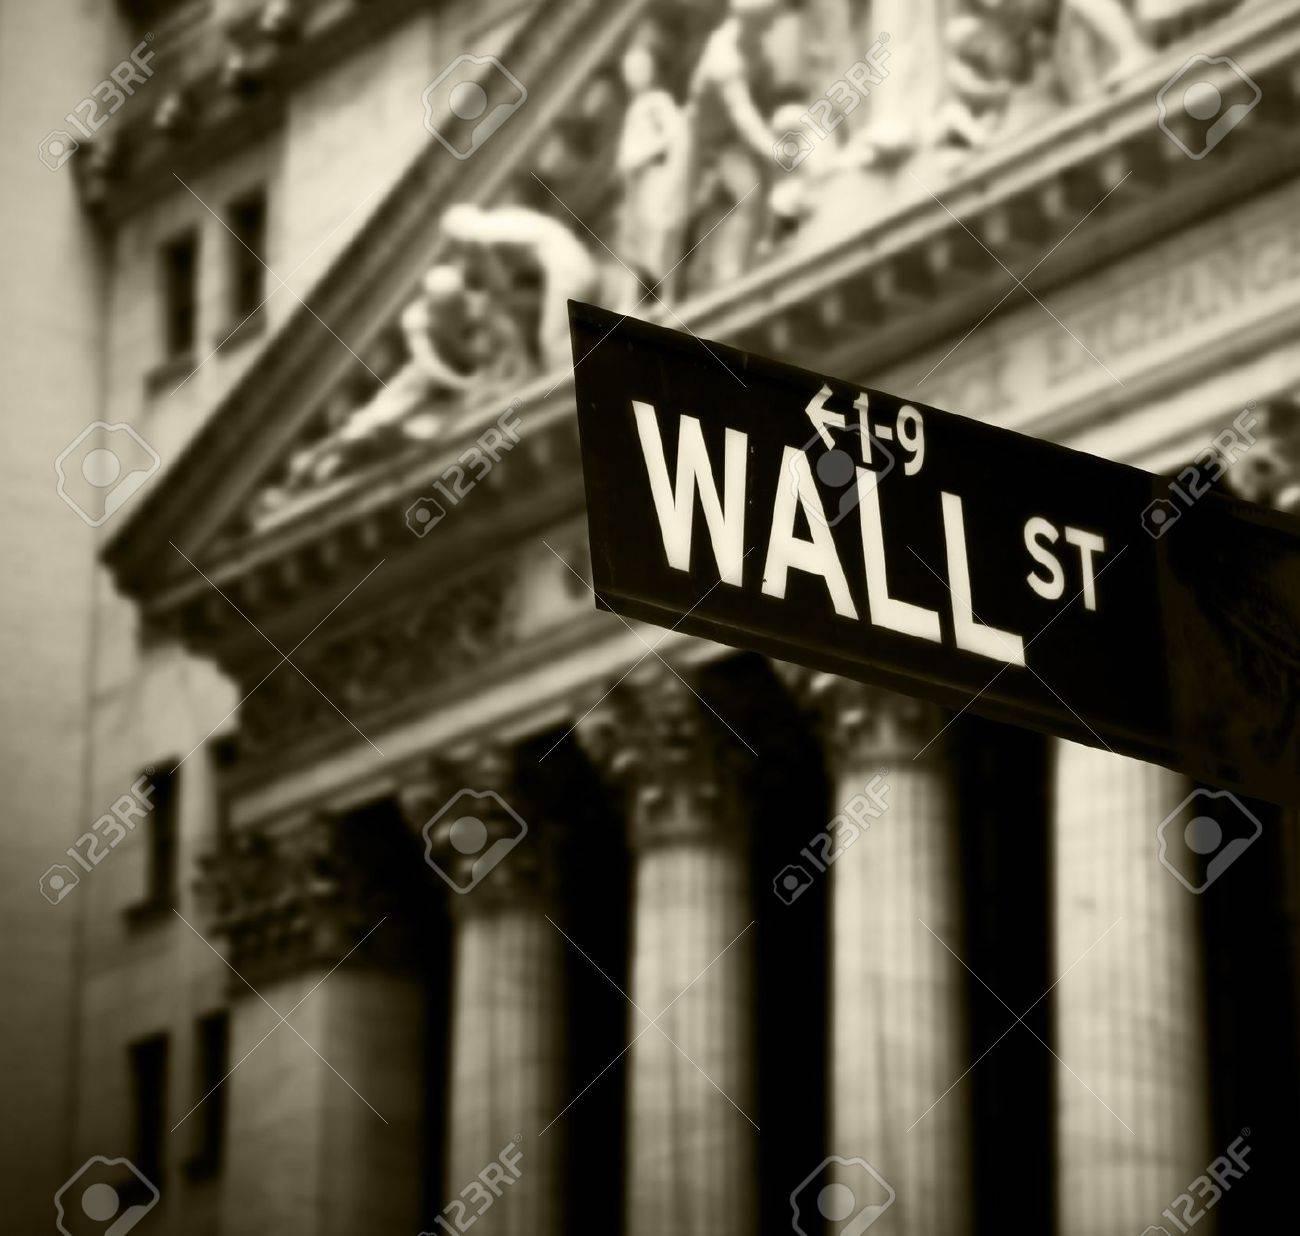 Wall Street sign in lower Manhattan New York Stock Photo - 12368405